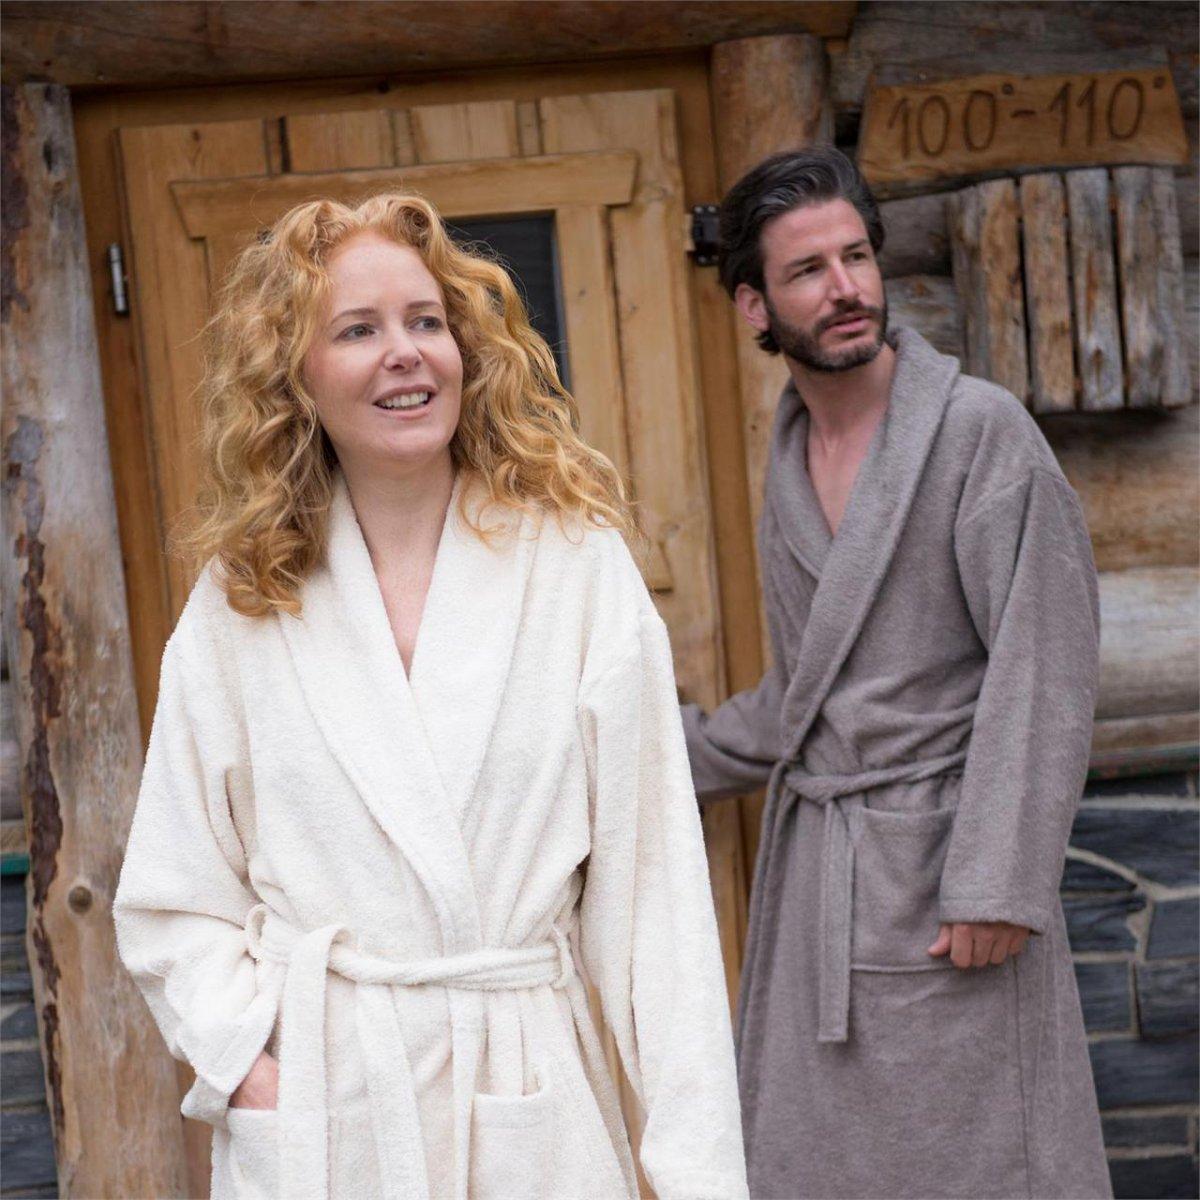 Adults bathrobe